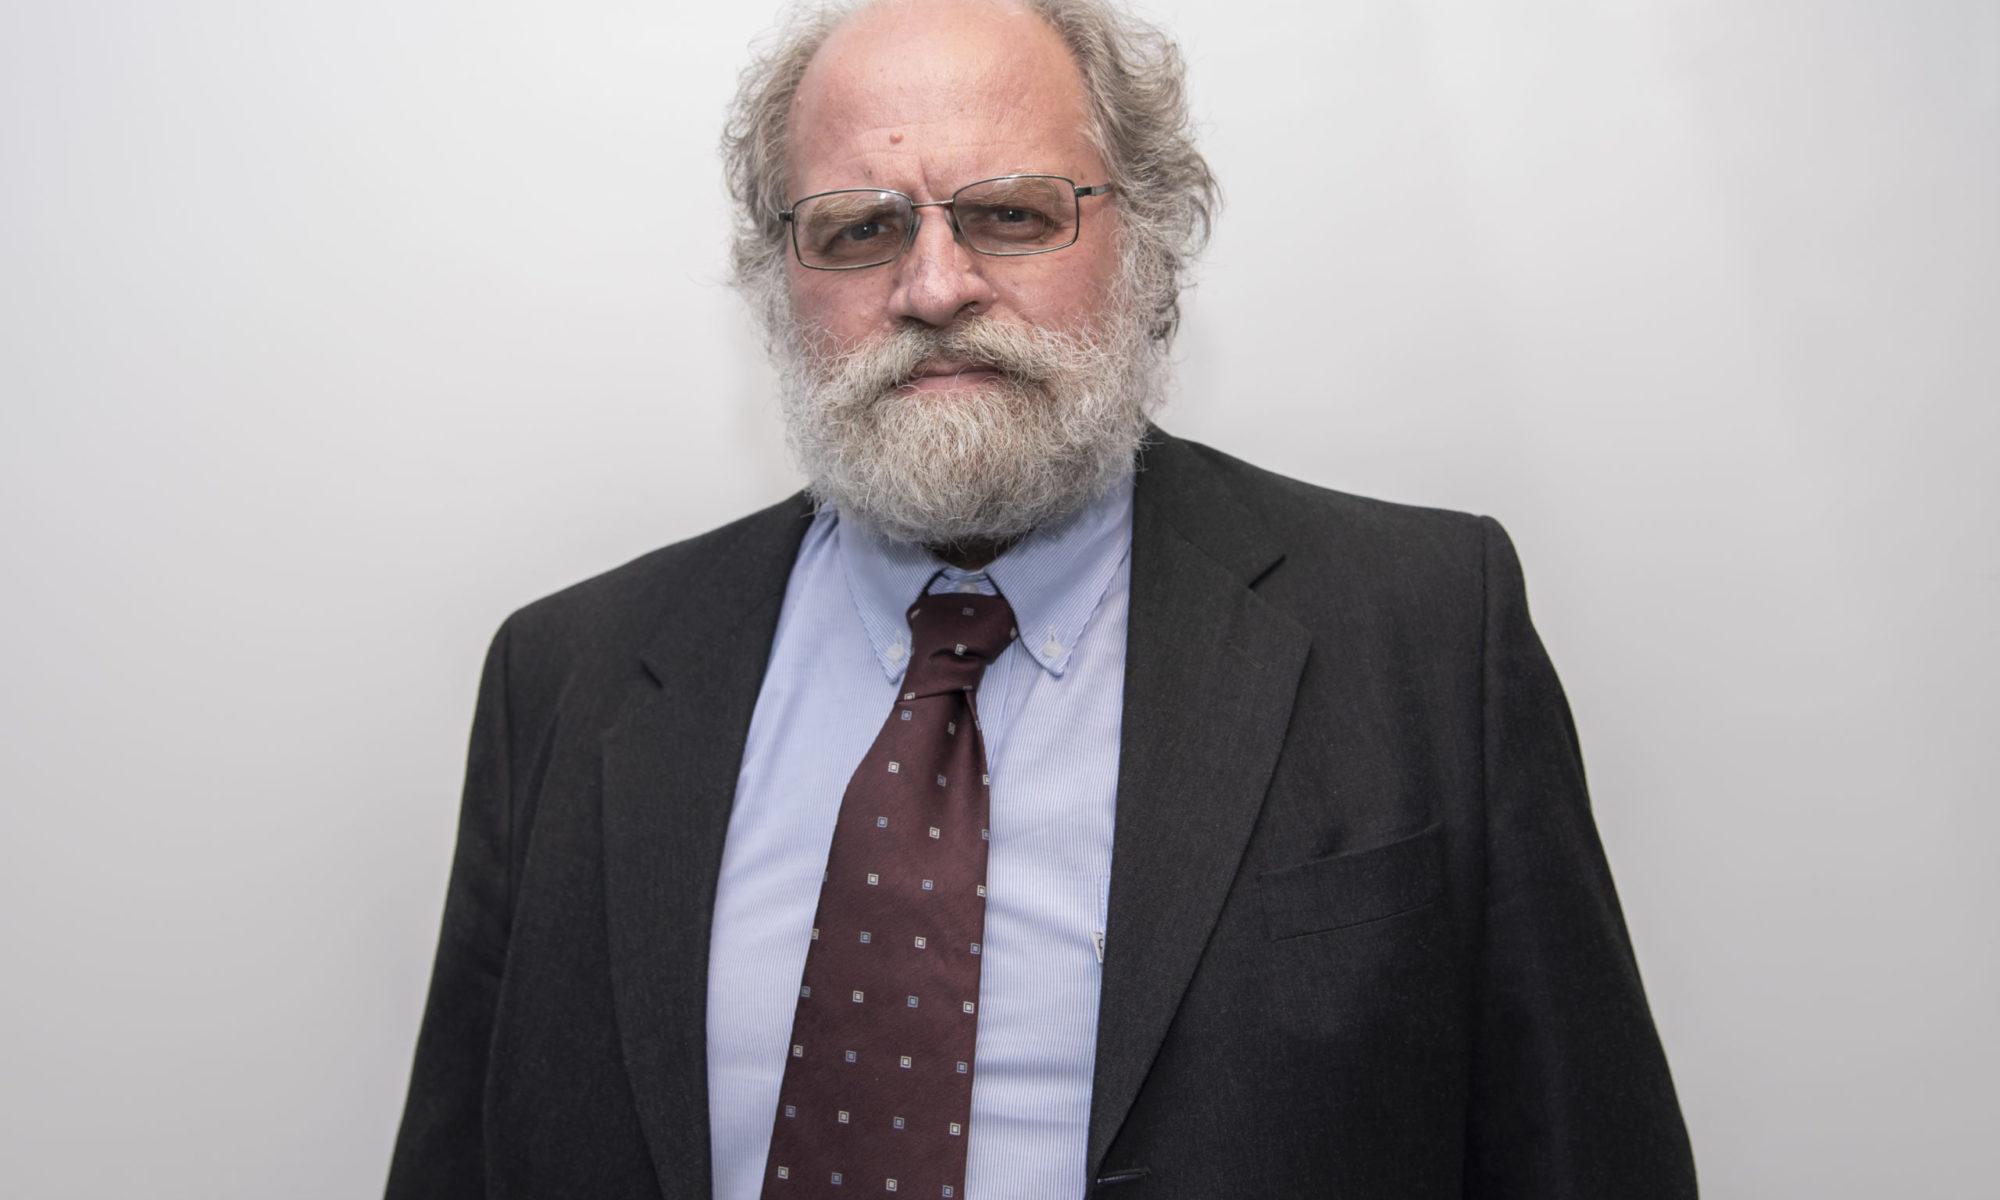 Daniel Jorge Somma